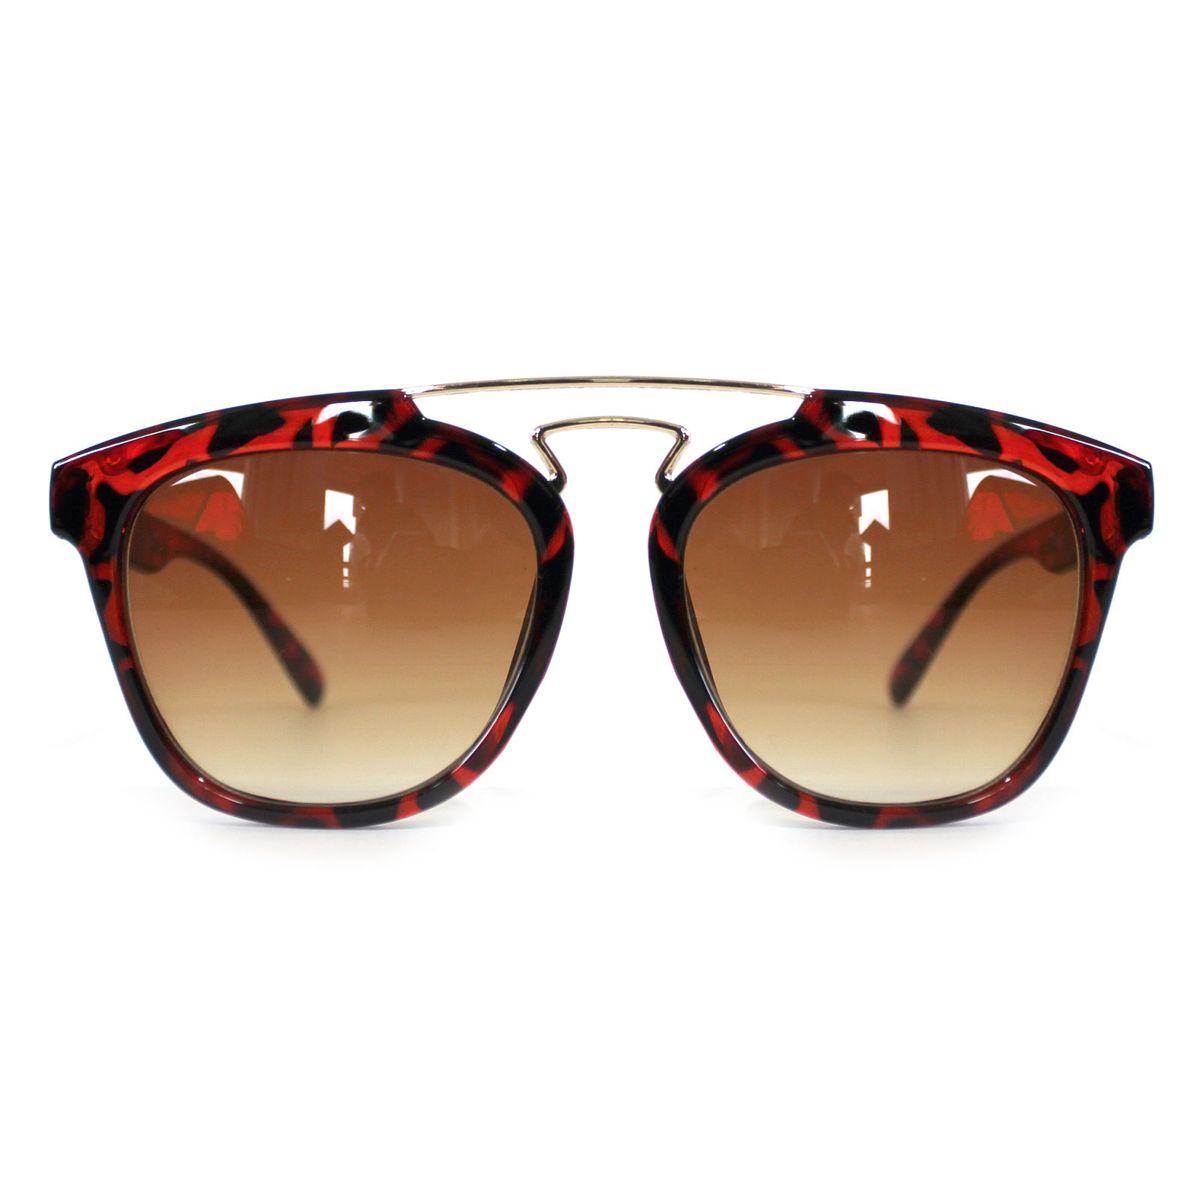 anos 70 magia - óculos importado.  Czm6ly9wag90b3muzw5qb2vplmnvbs5ici9wcm9kdwn0cy82nzqync84zdgxnzzimmfly2fhzmmxytuymmq5mtfmzjiymwuyzi5qcgc  ... 1d791b53e7